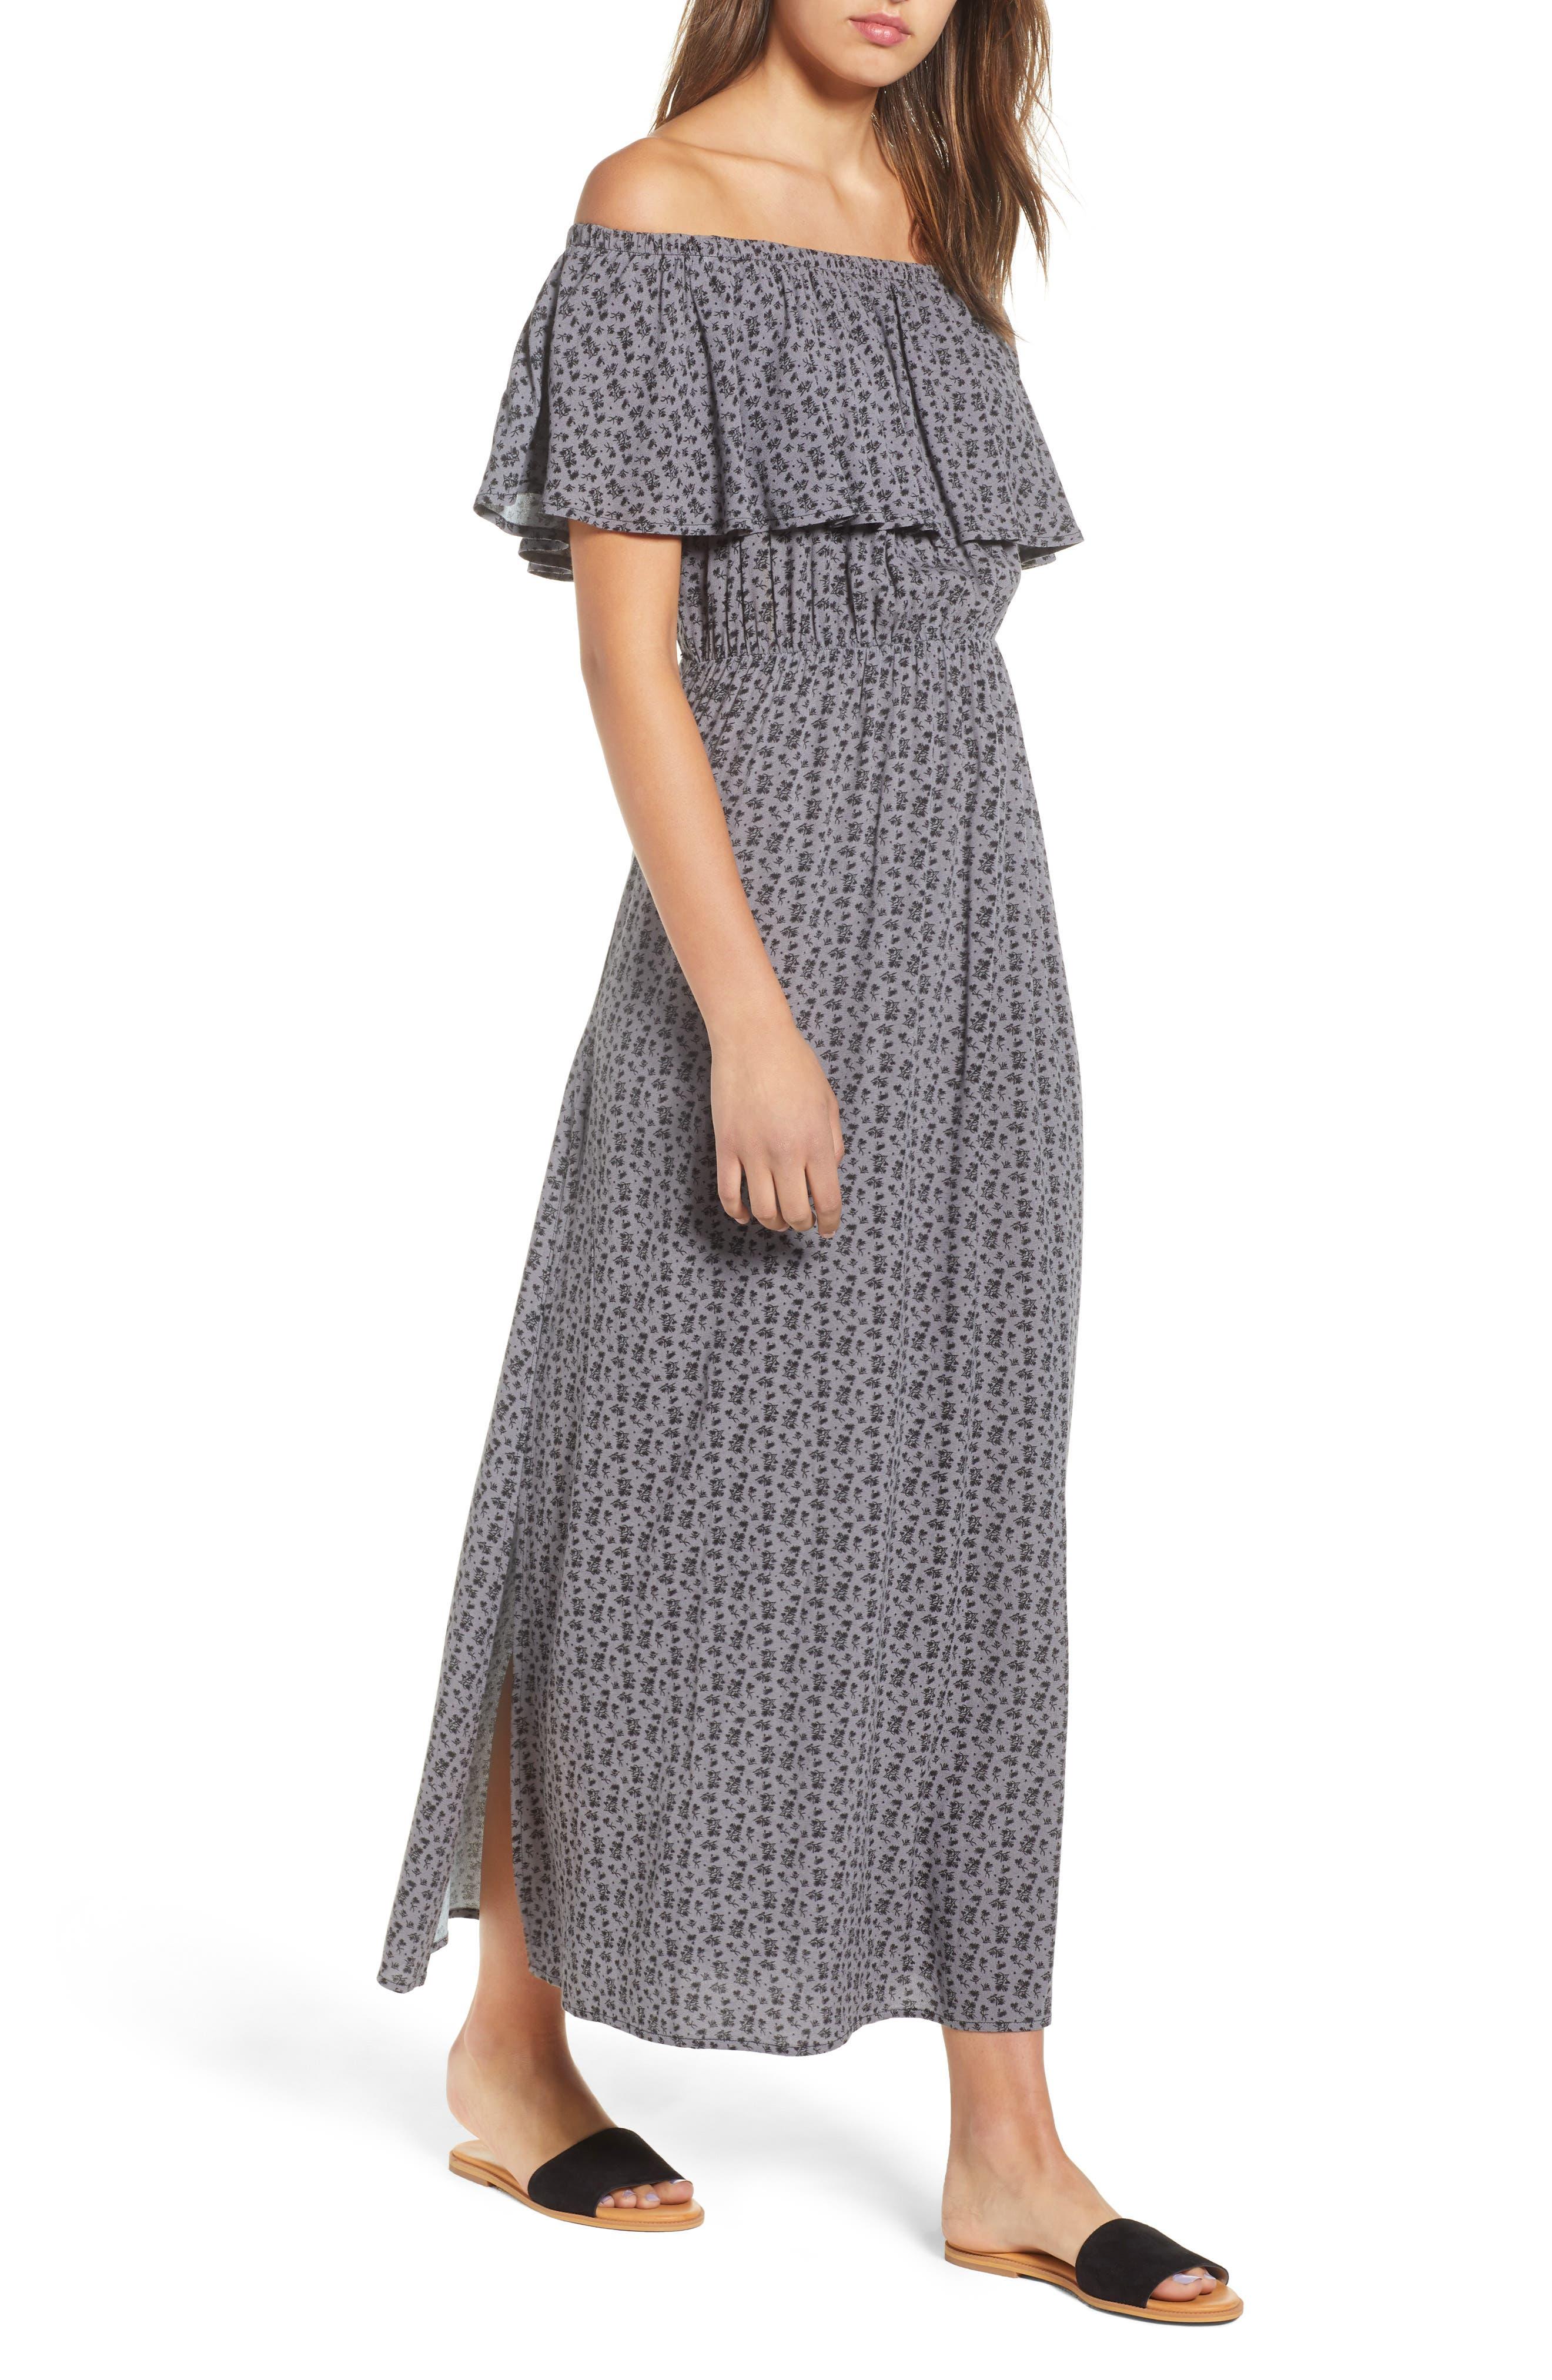 LIRA CLOTHING,                             Marissa Floral Print Off the Shoulder Dress,                             Main thumbnail 1, color,                             250